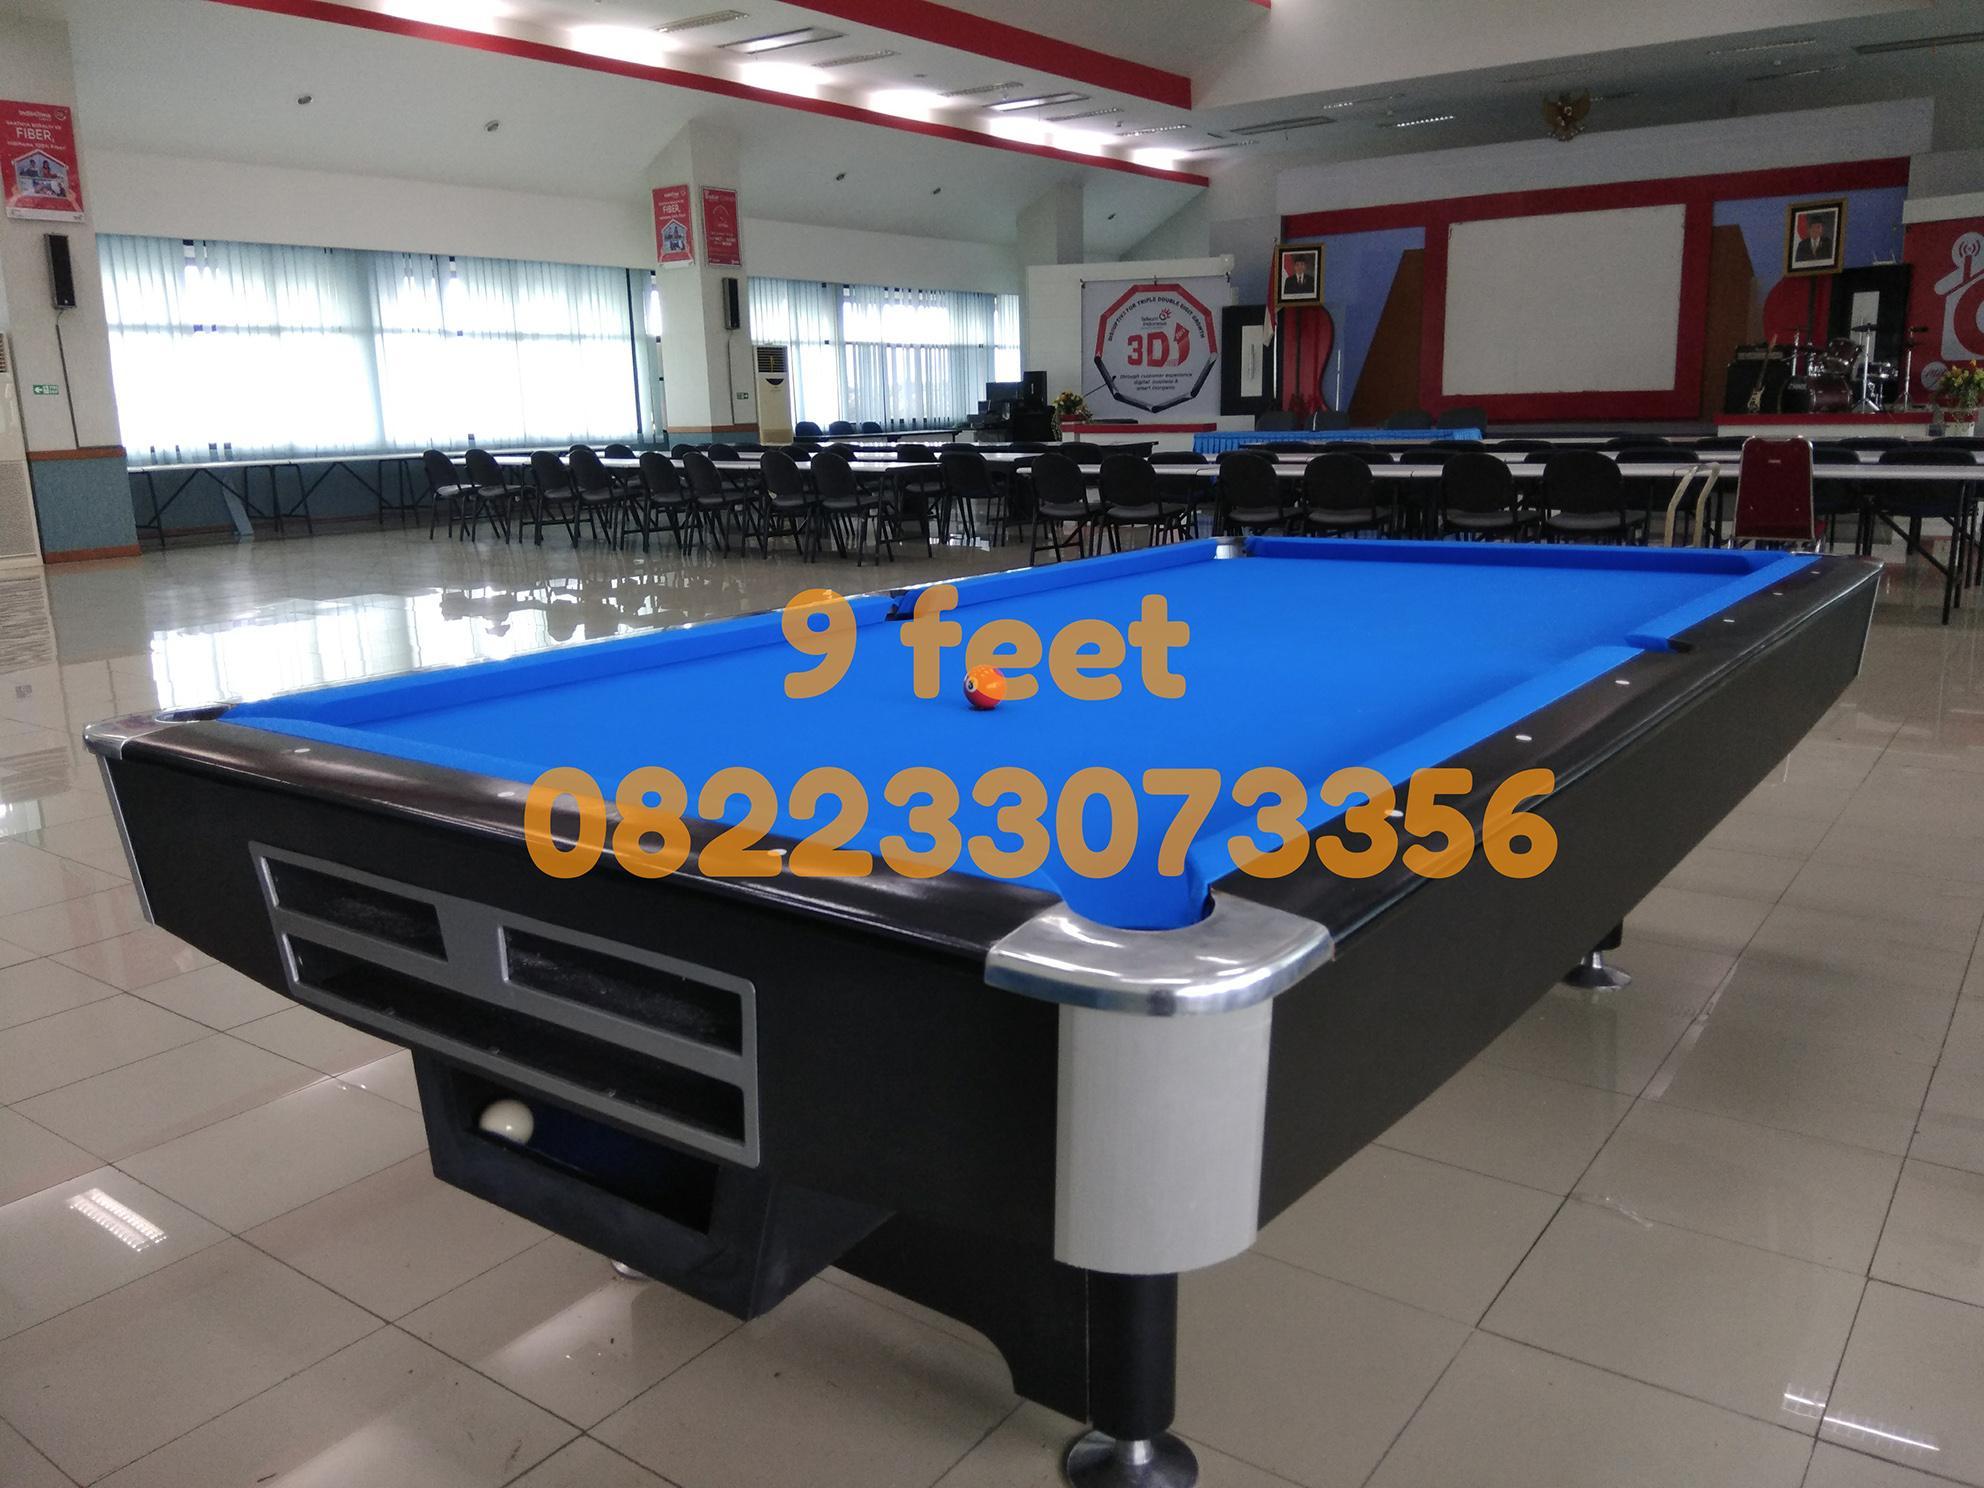 Billiard 9 Feet Surabaya